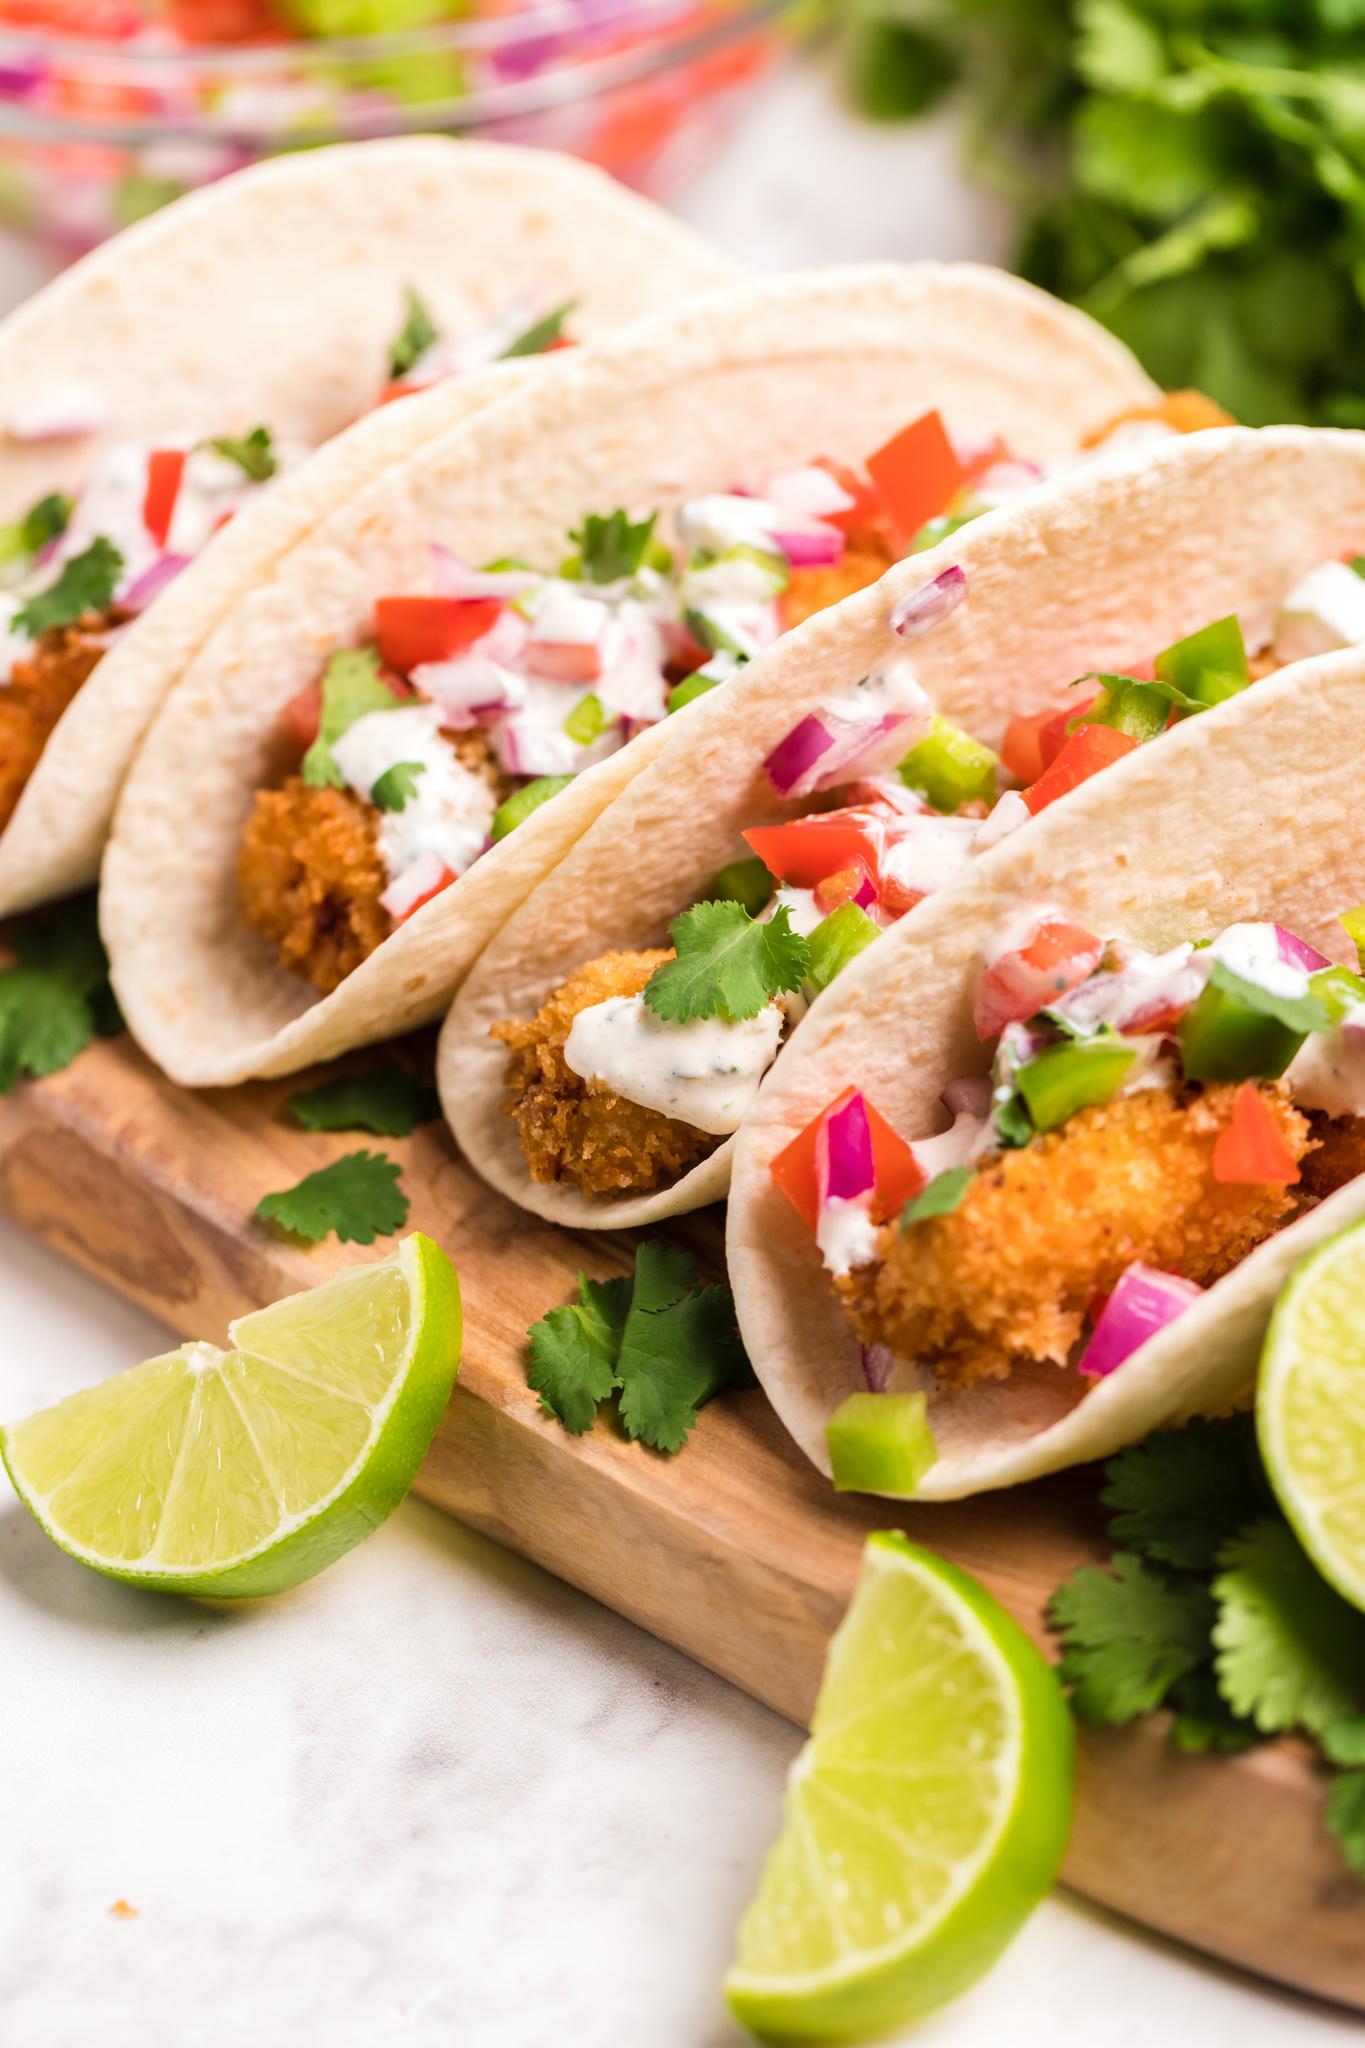 Tilapia Fish Taco Recipe in taco shells.